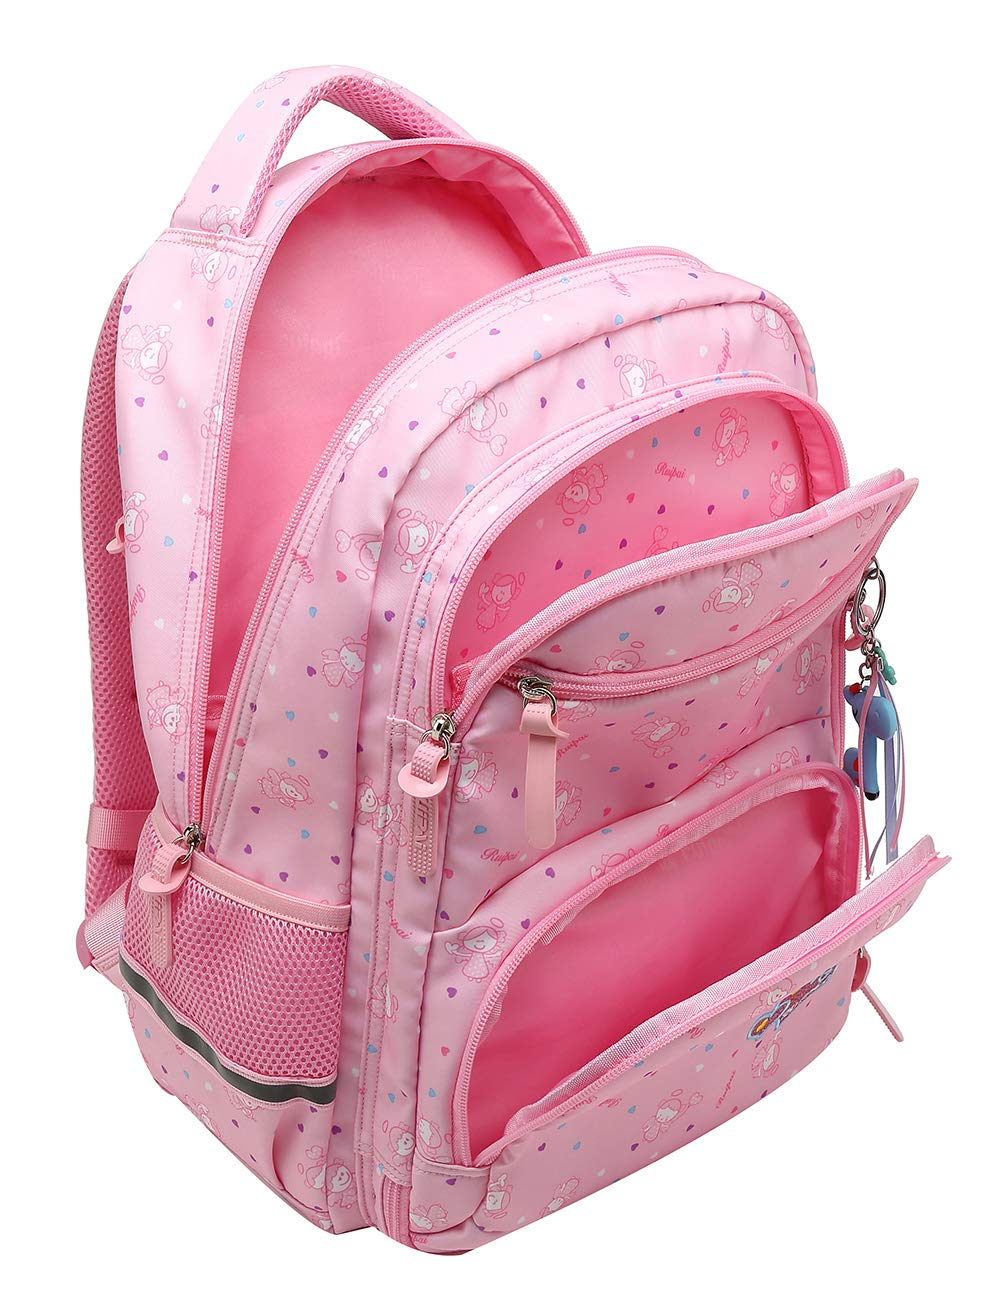 71eg1fQd PL - SellerFun UKXB106 - Mochila Infantil Niños, 22 L Style B Pink (Rosa) - UKXB426E1